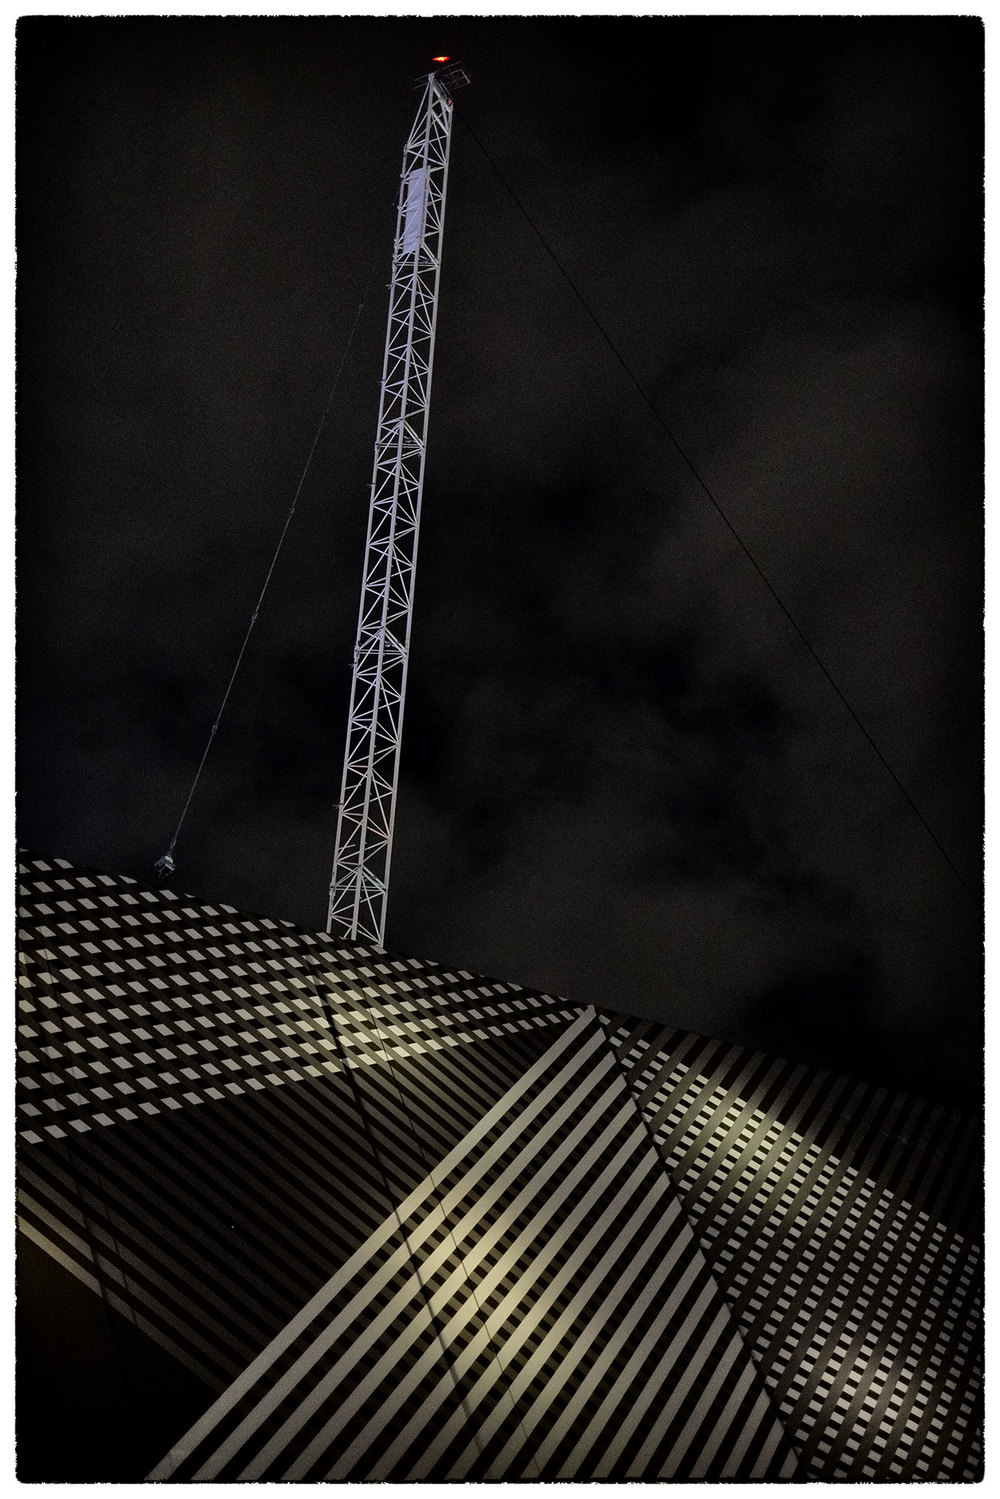 Crane above St James's Market, London, this evening.